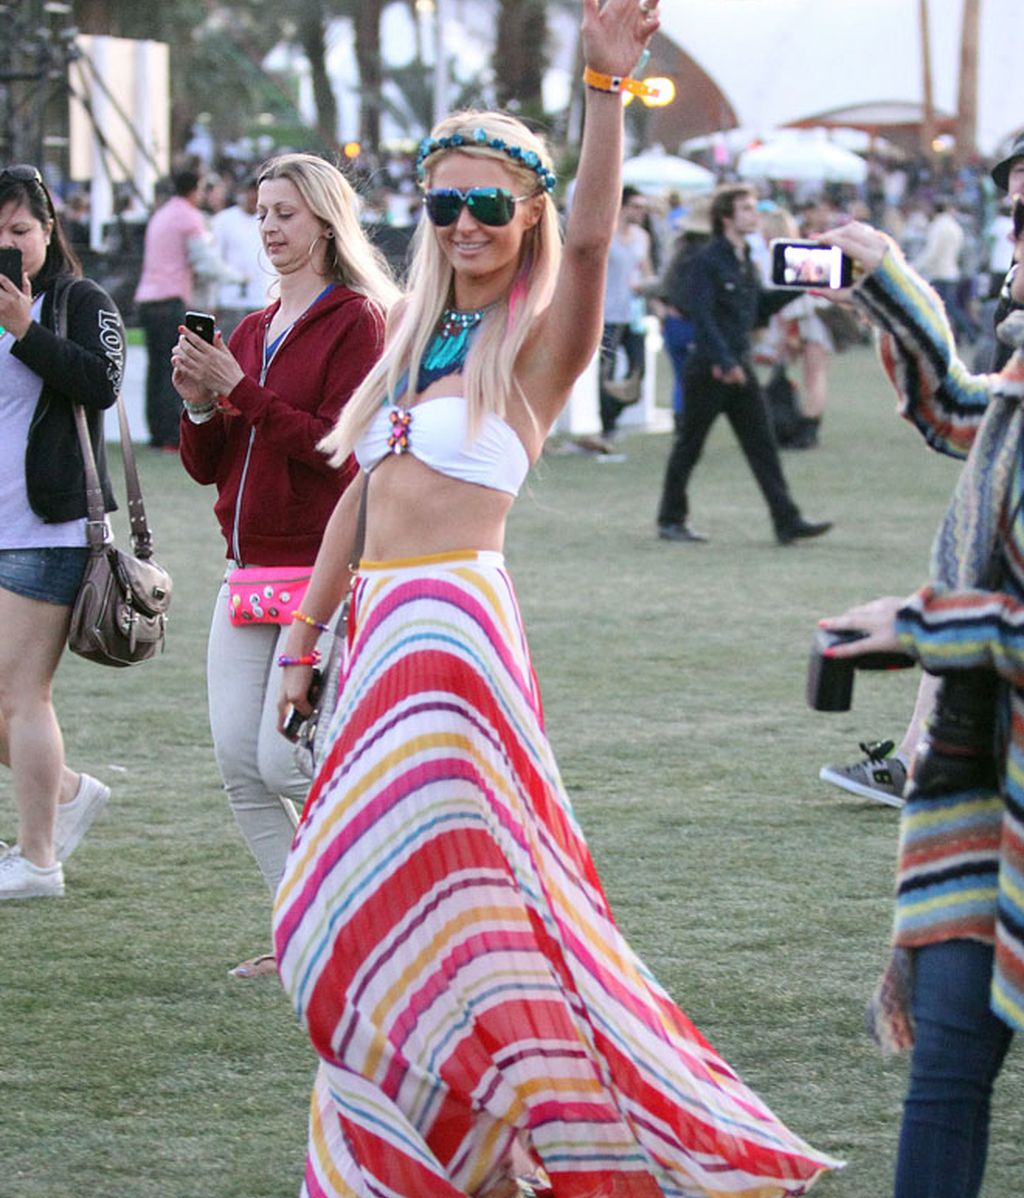 Los looks festivaleros de Paris Hilton, Ke$ha y Vanessa Hudgens